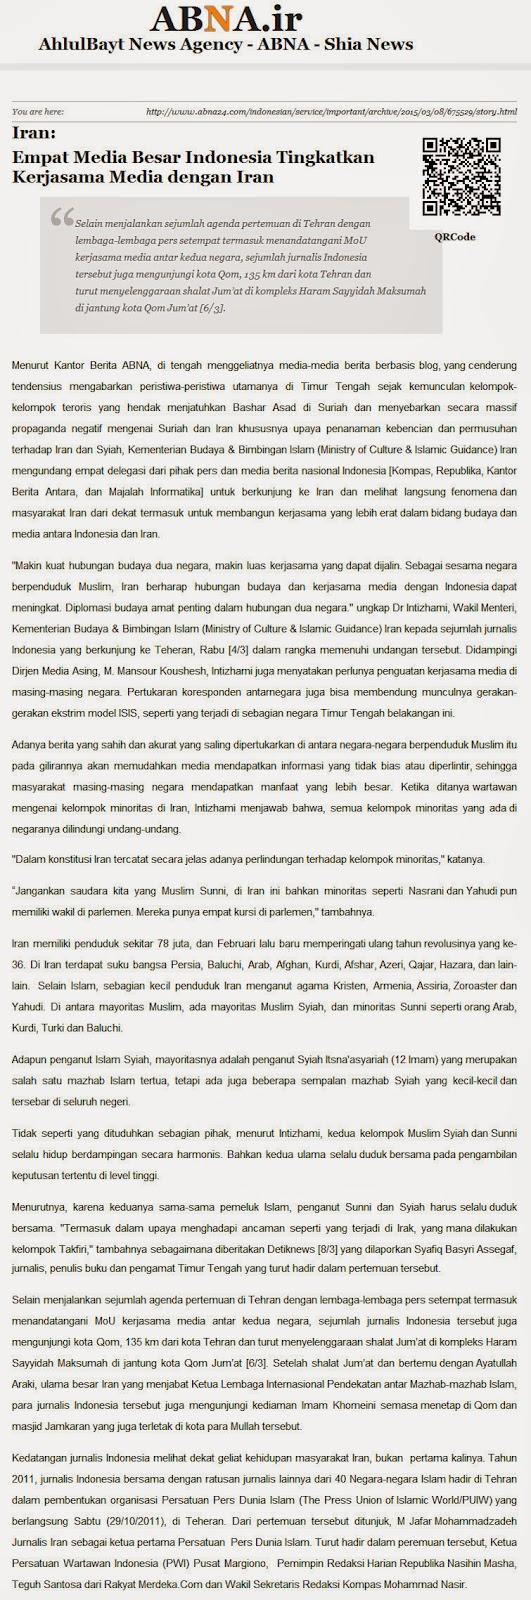 Media Indonesia Kerjasama Syiah Iran